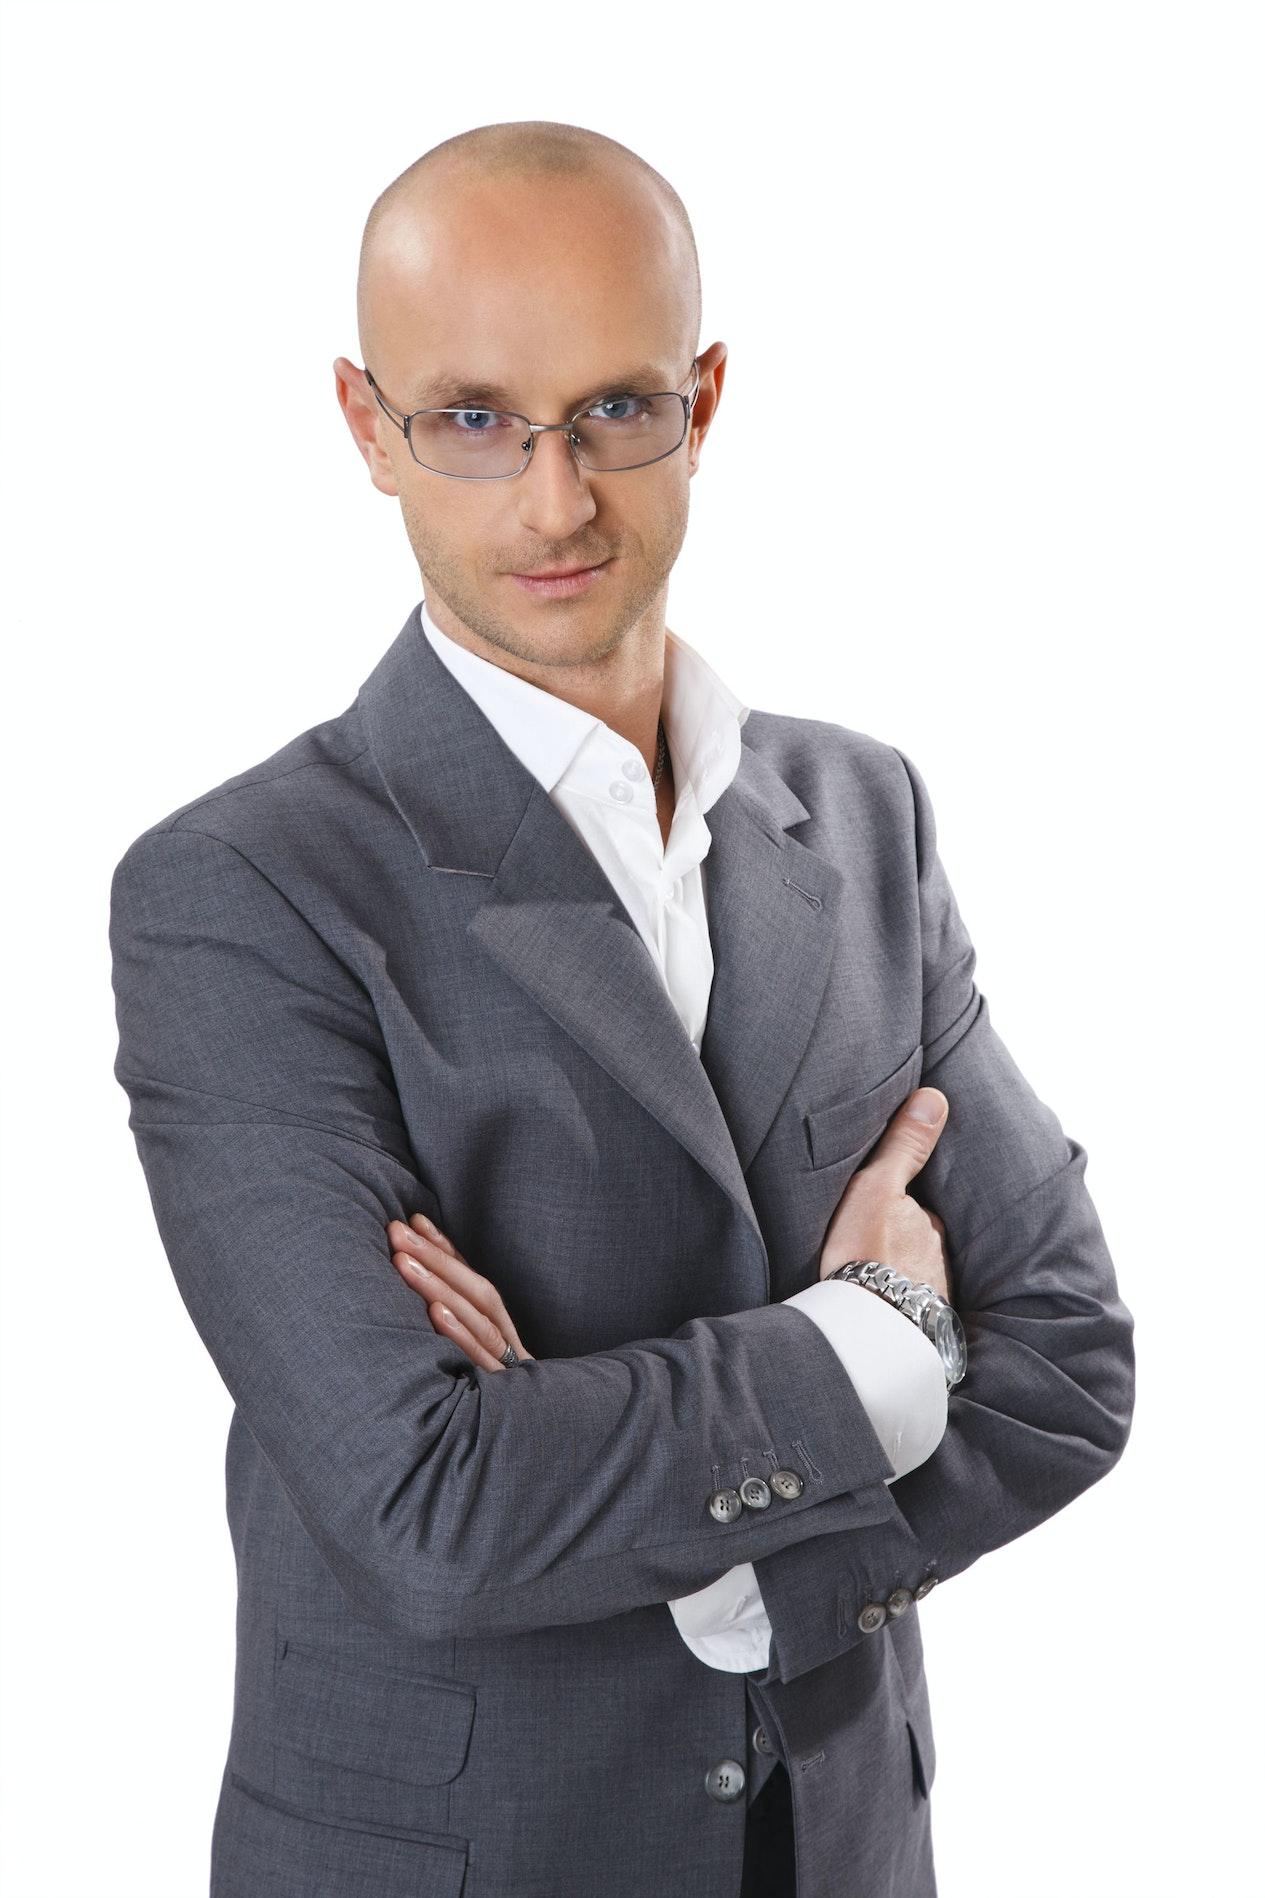 (c) Jürgen Hammerschmid